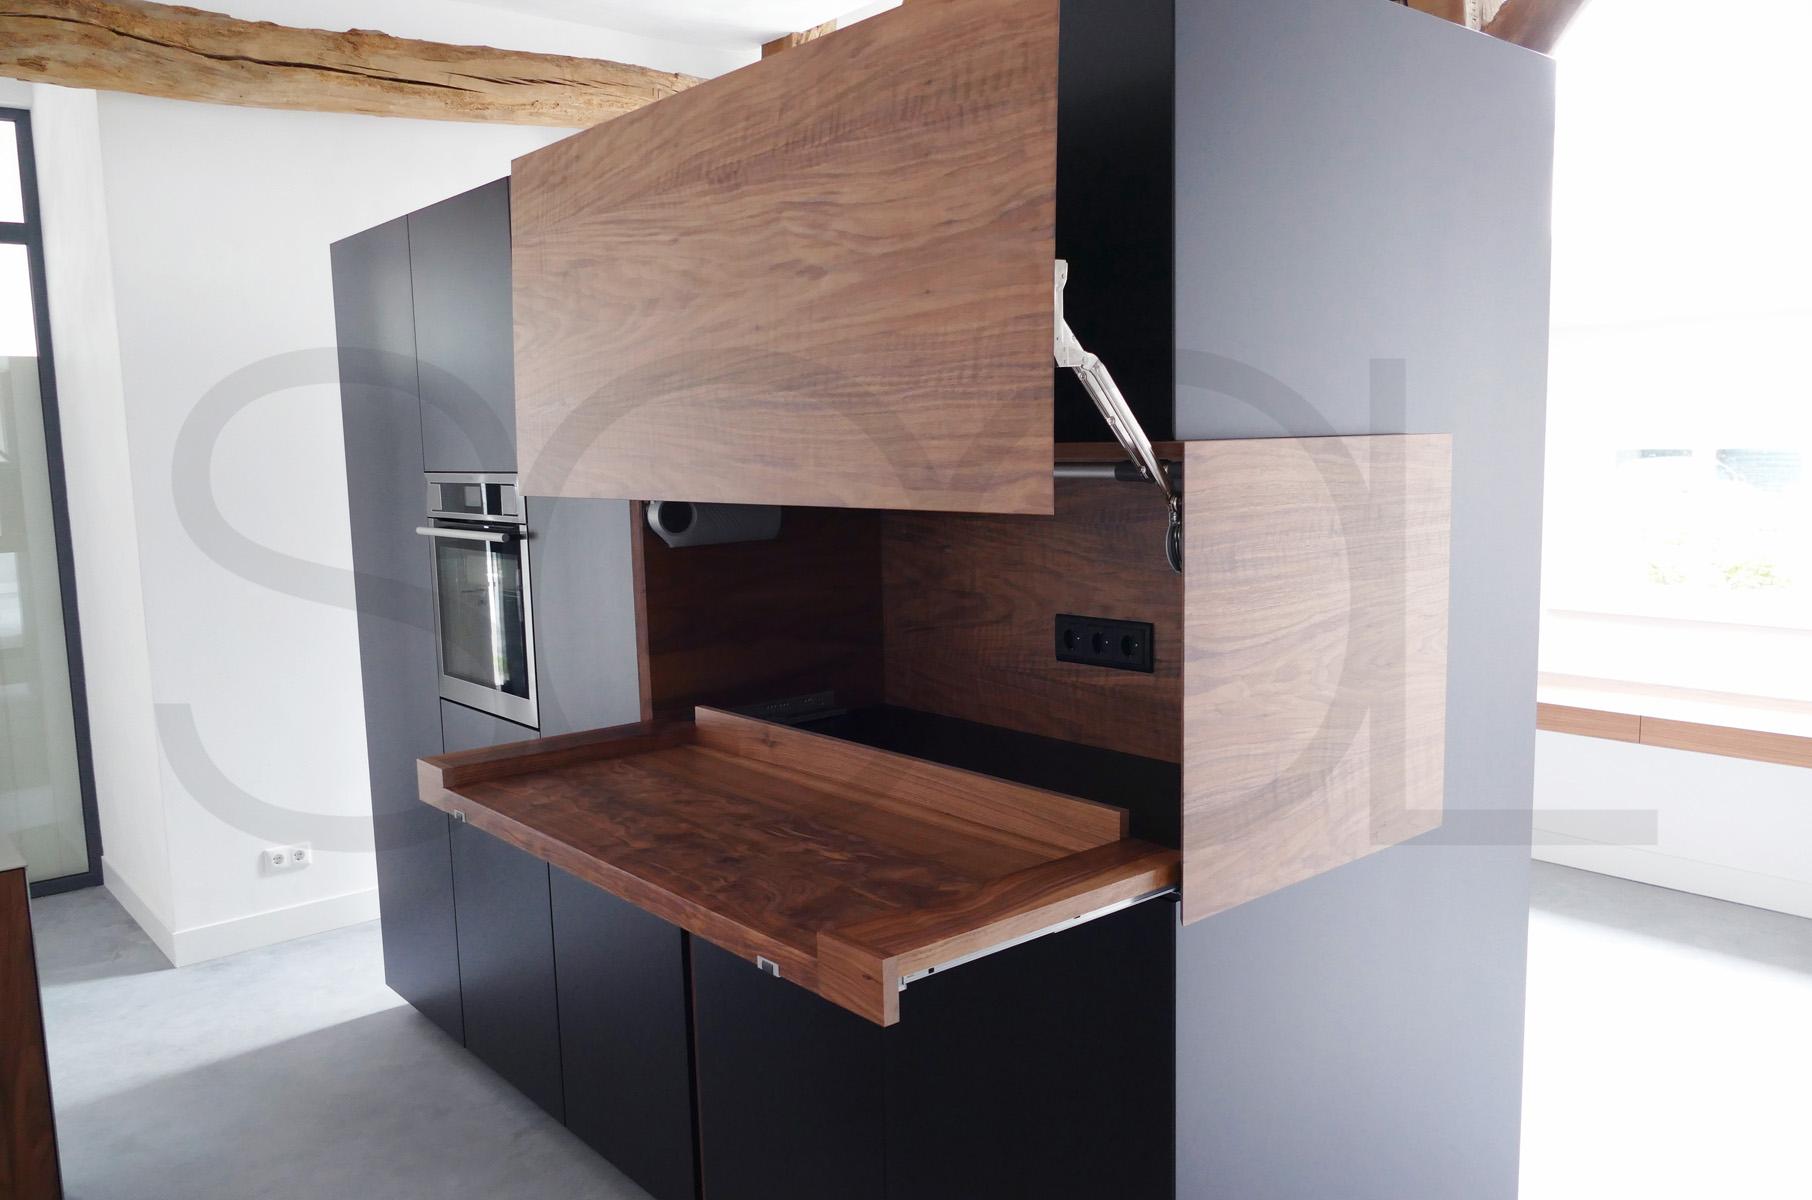 keukenobject van zwart MDF en notenhout